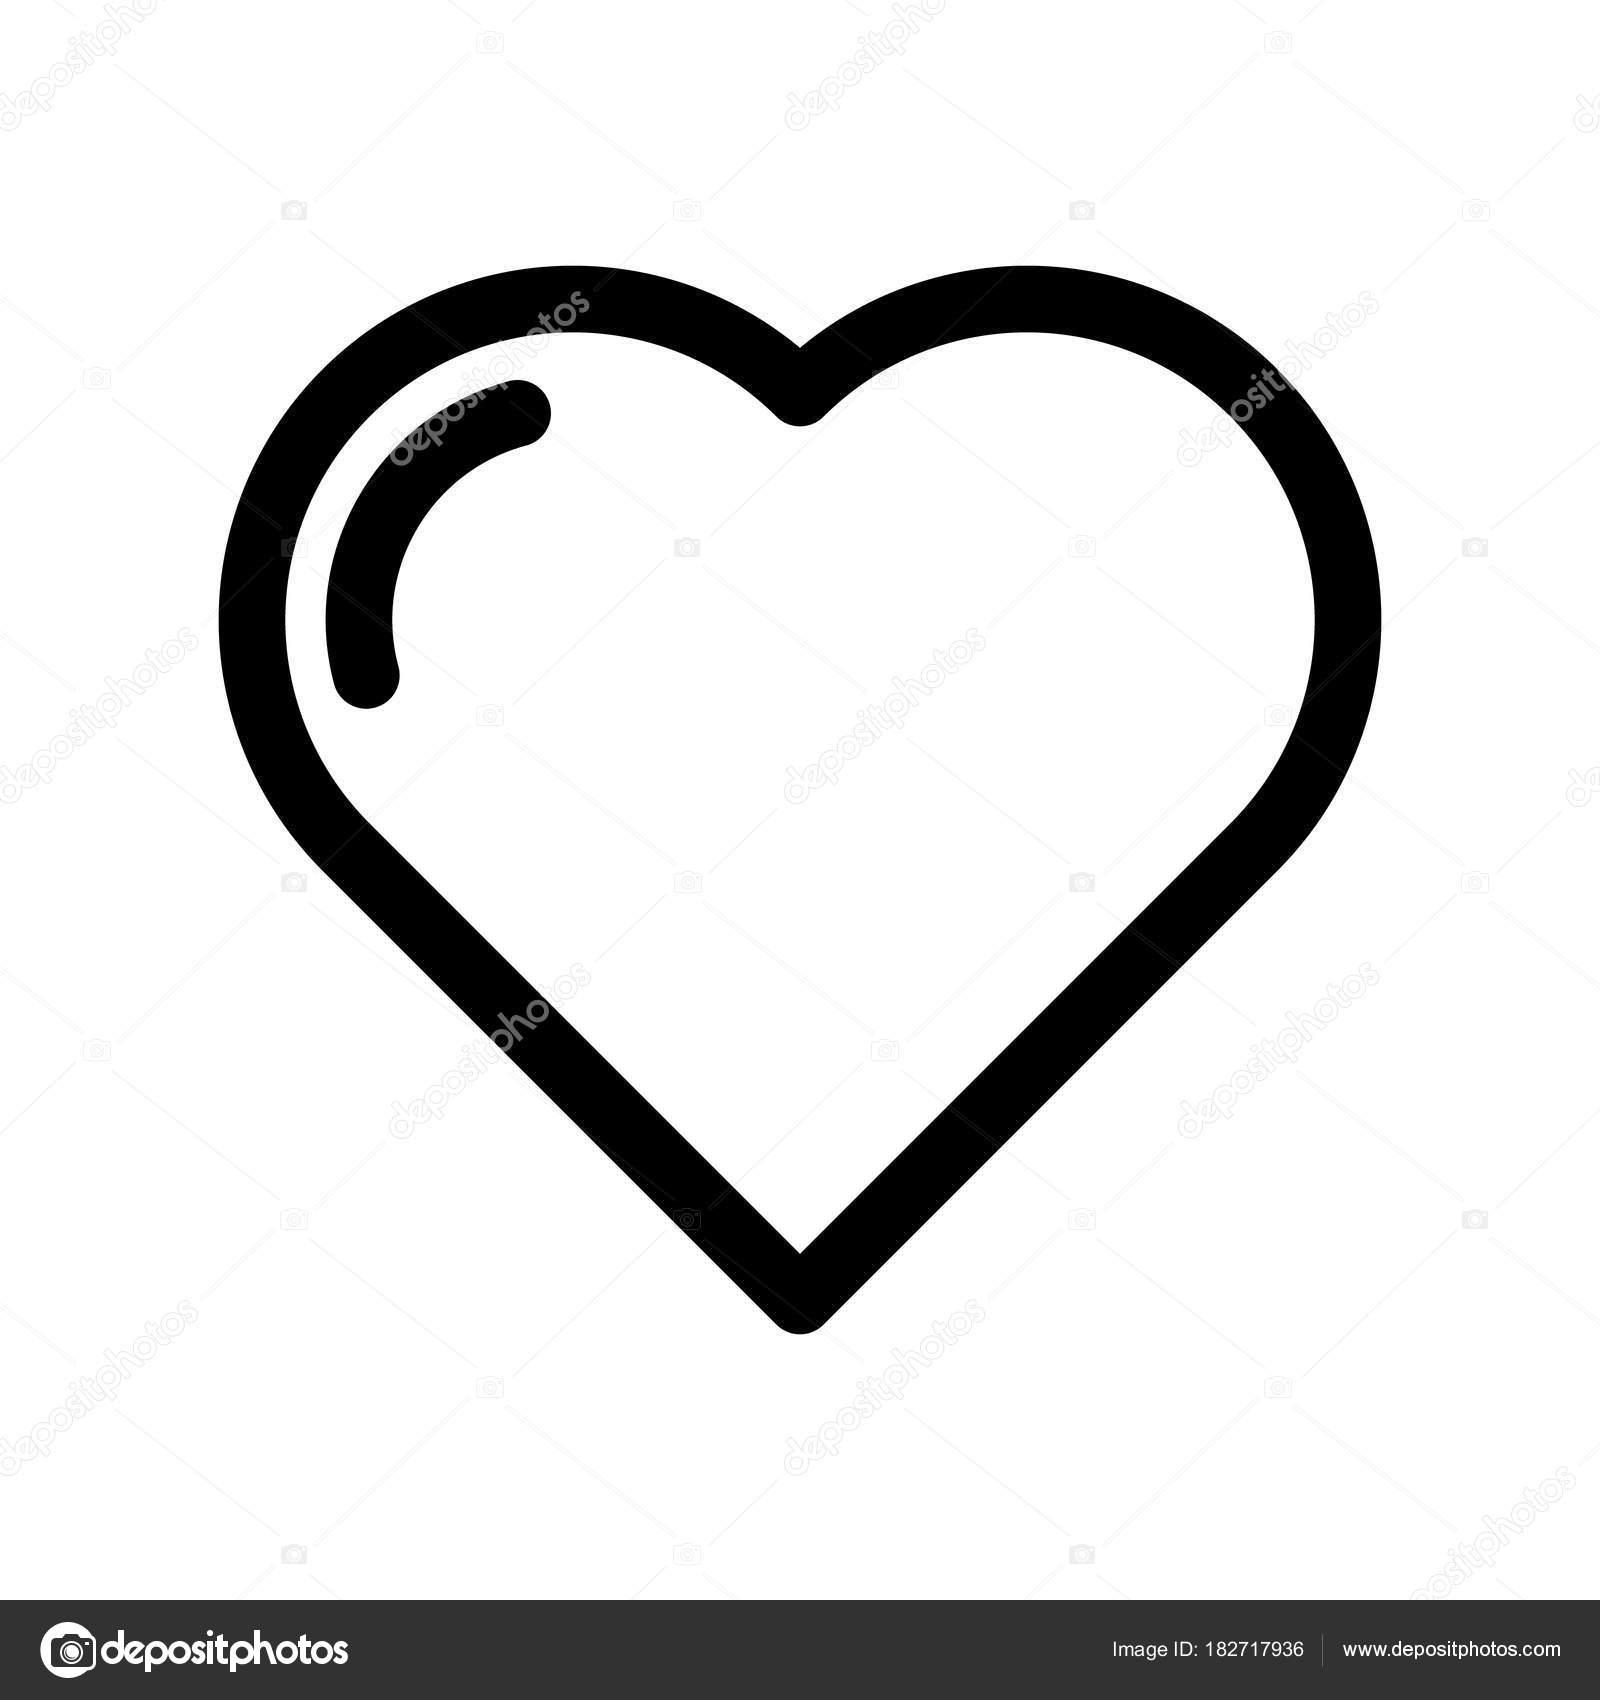 Heart icon symbol of love wedding and saint valentine outline heart icon symbol of love wedding and saint valentine outline modern design element buycottarizona Image collections